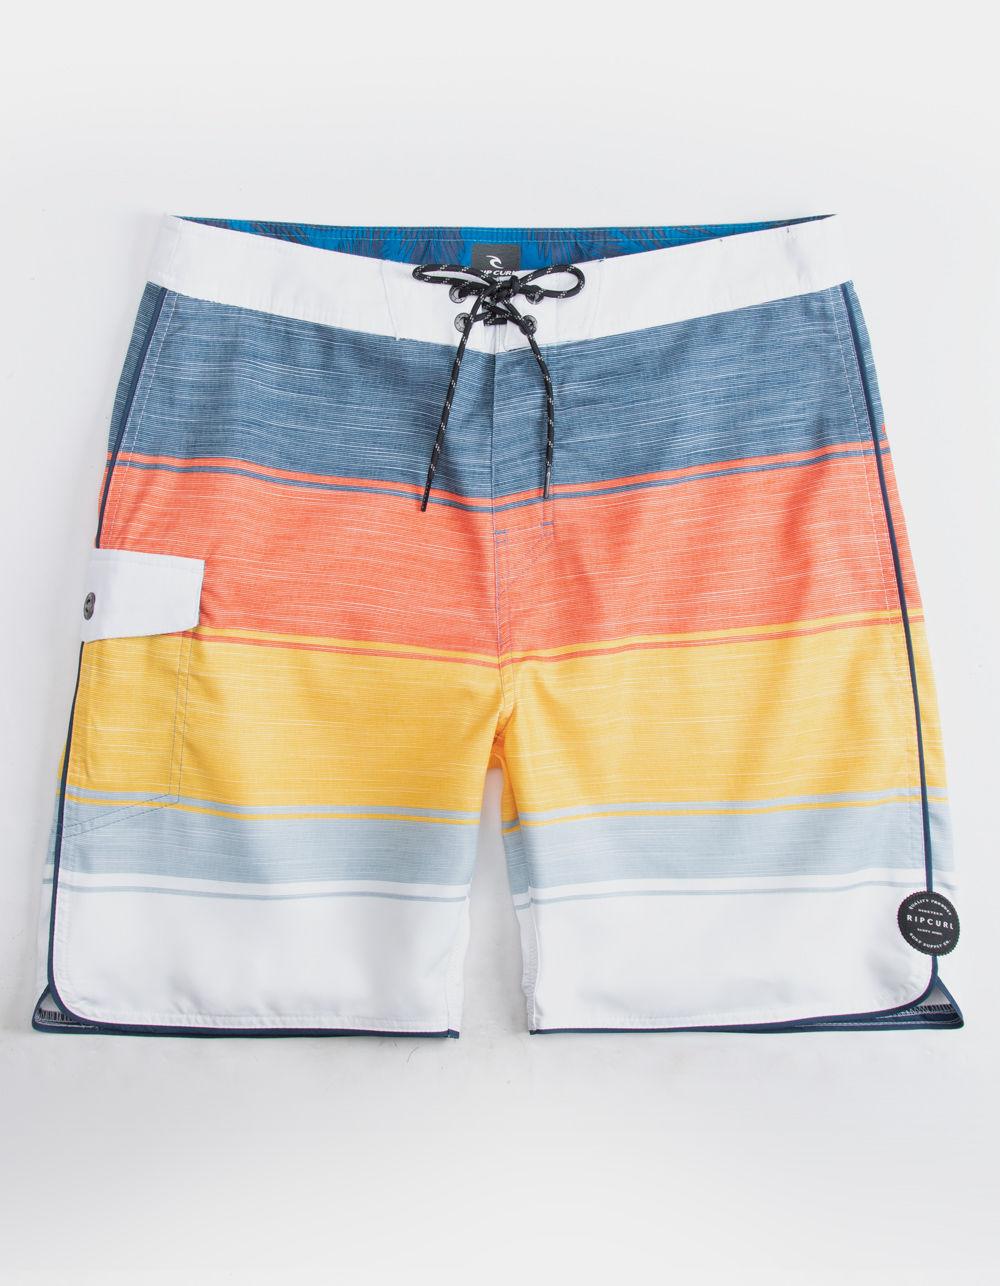 Men's Boardshorts: Beach Shorts, Surf Shorts & Swim Trunks | Tillys